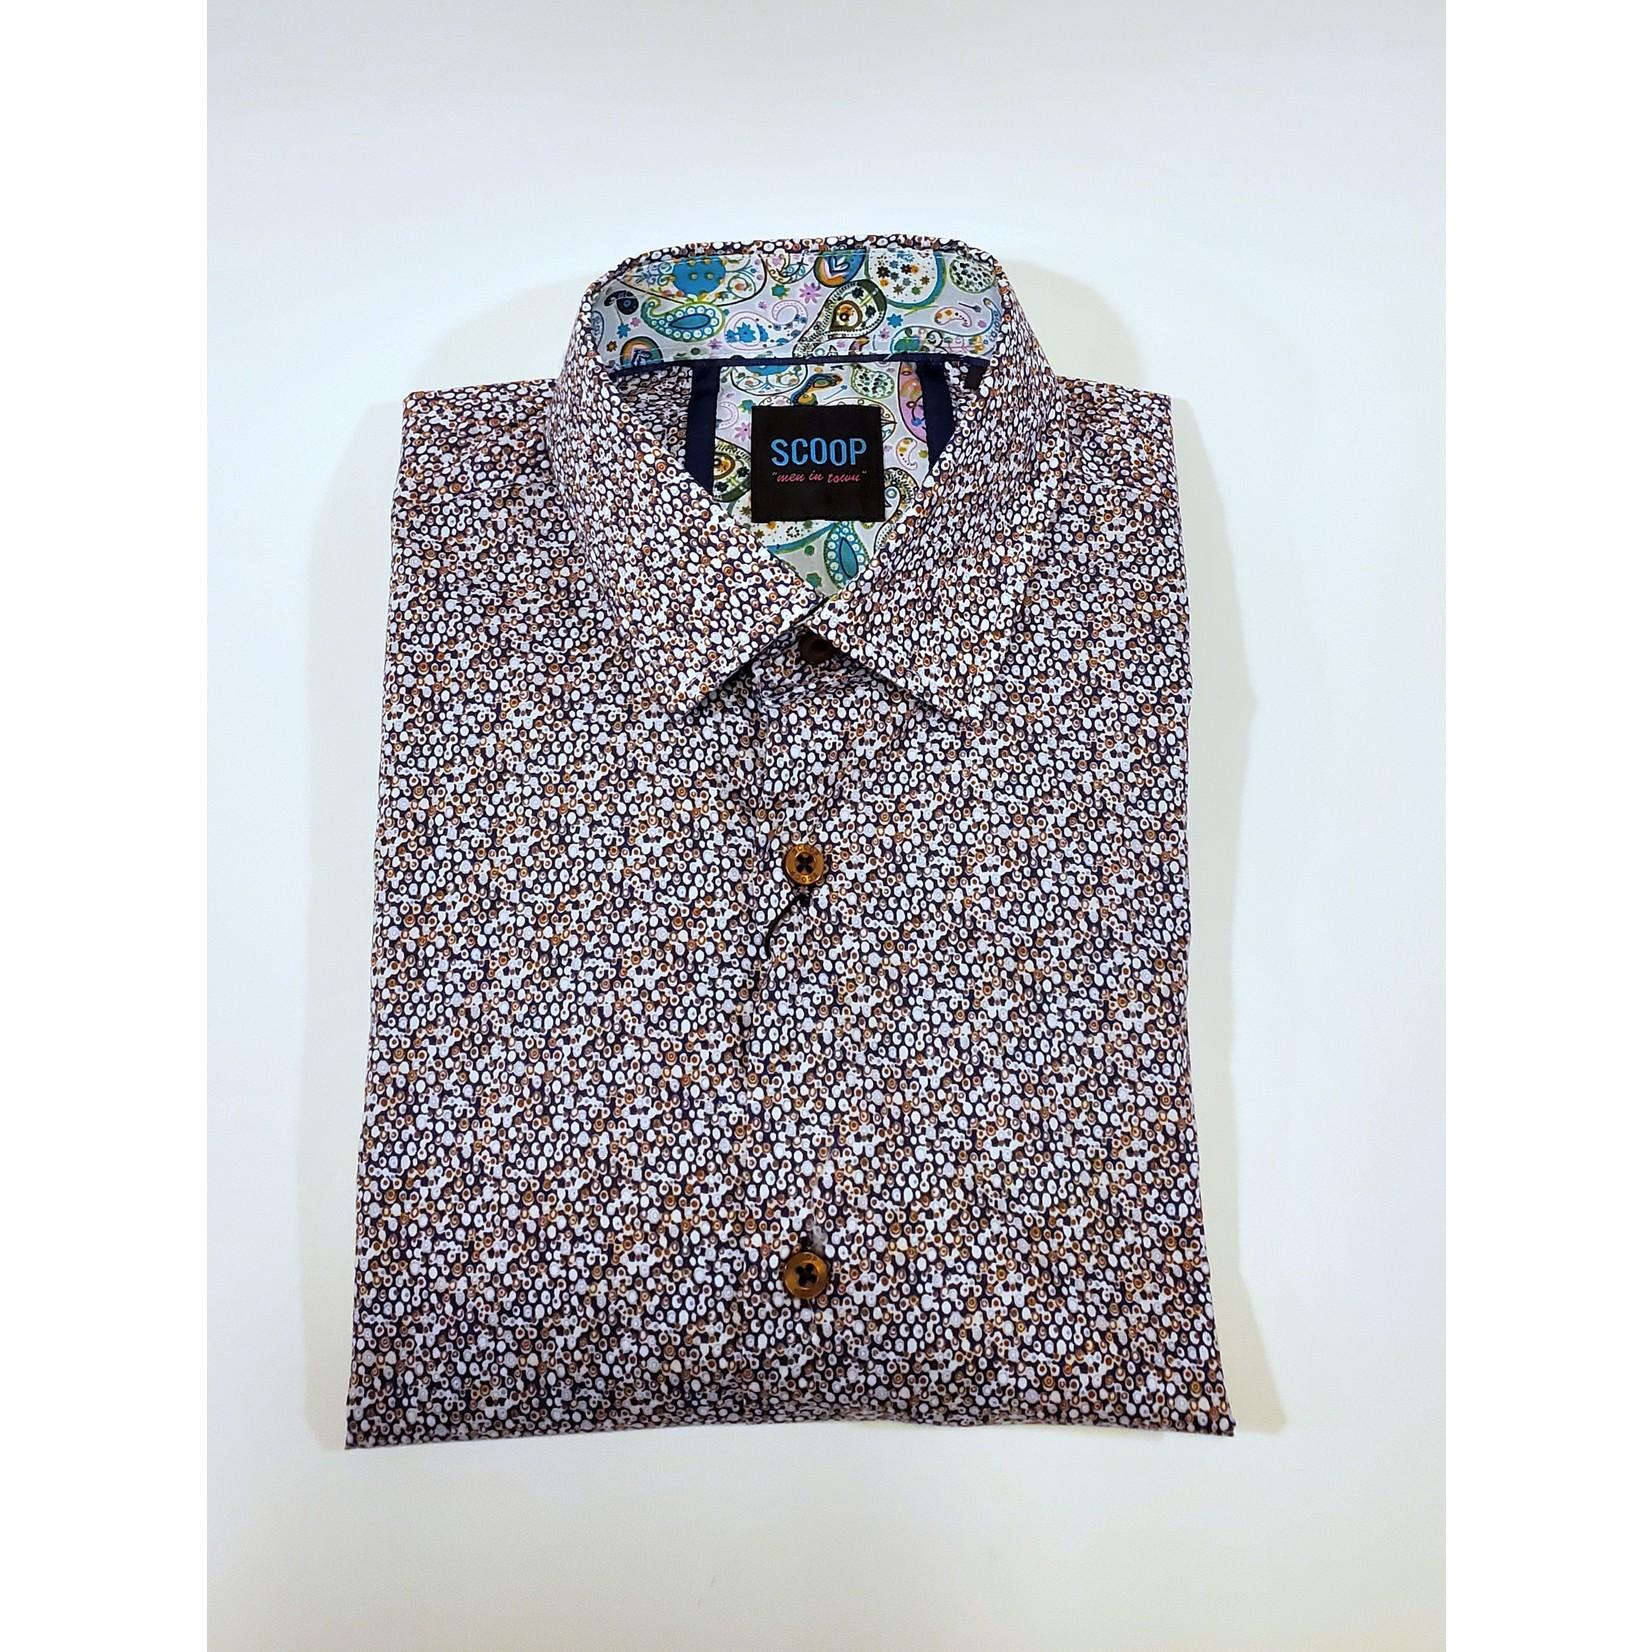 Scoop Solane Short-Sleeve Shirt